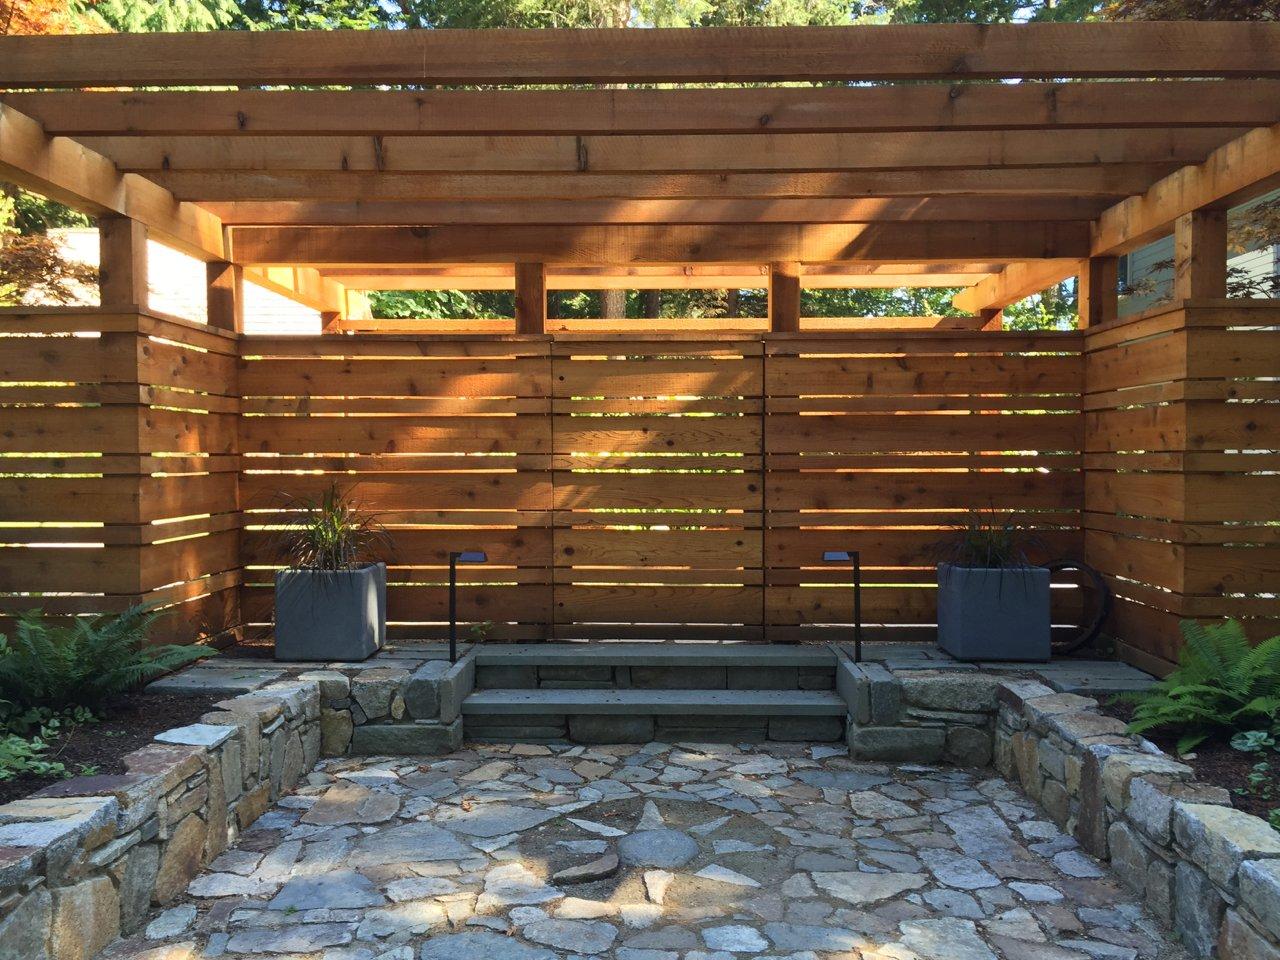 Outdoor, Stone Patio, Porch, Deck, Wood Fences, Wall, and Horizontal Fences, Wall Entry  Cortes Island Custom Blu Prefab by Mark Spevakow